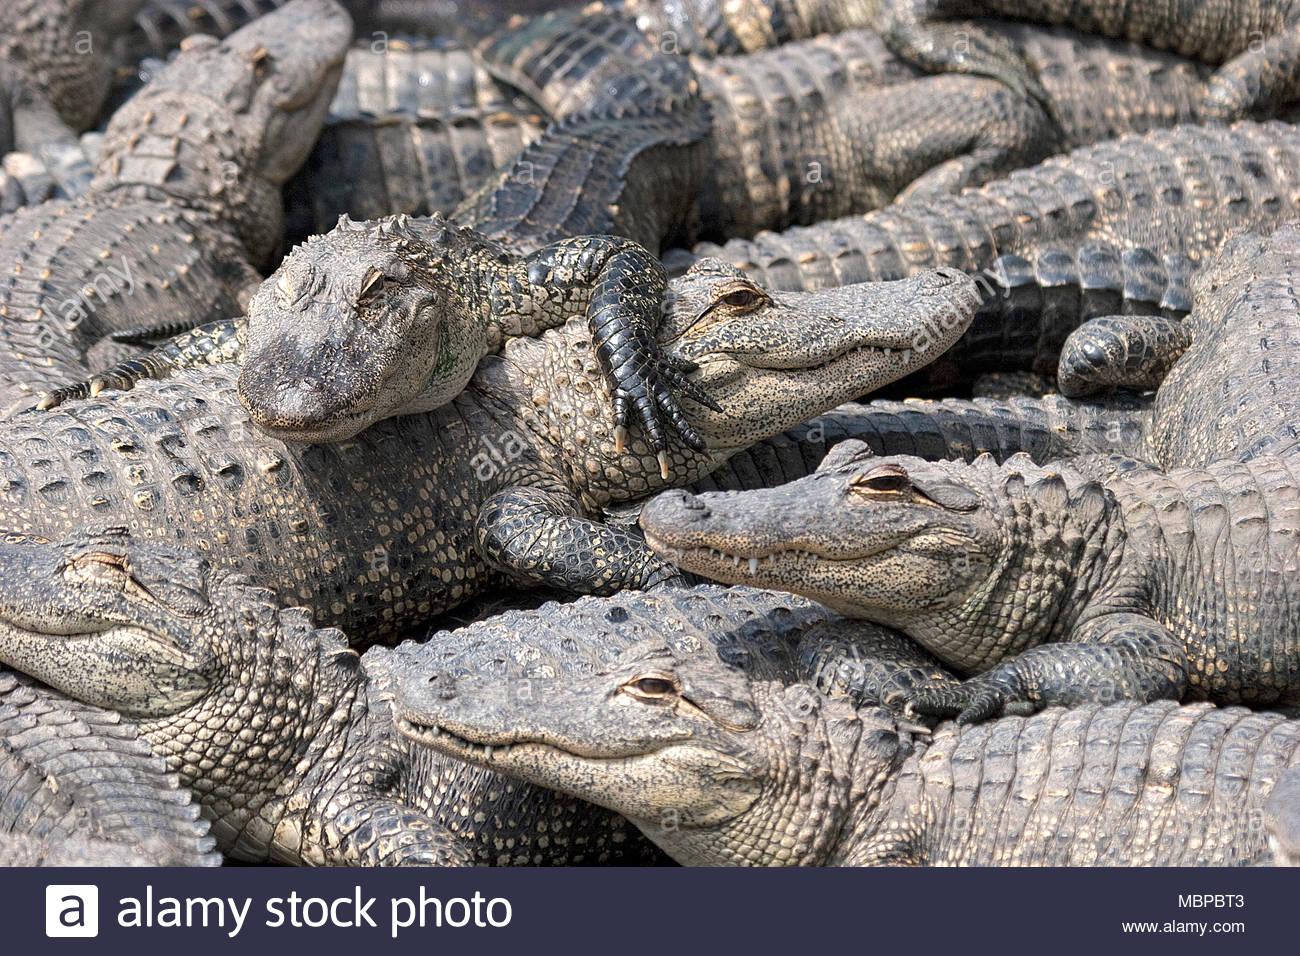 Mississippi alligator (Alligator mississippiensis), group, juvenile, Everglades, Florida, USA Stock Photo